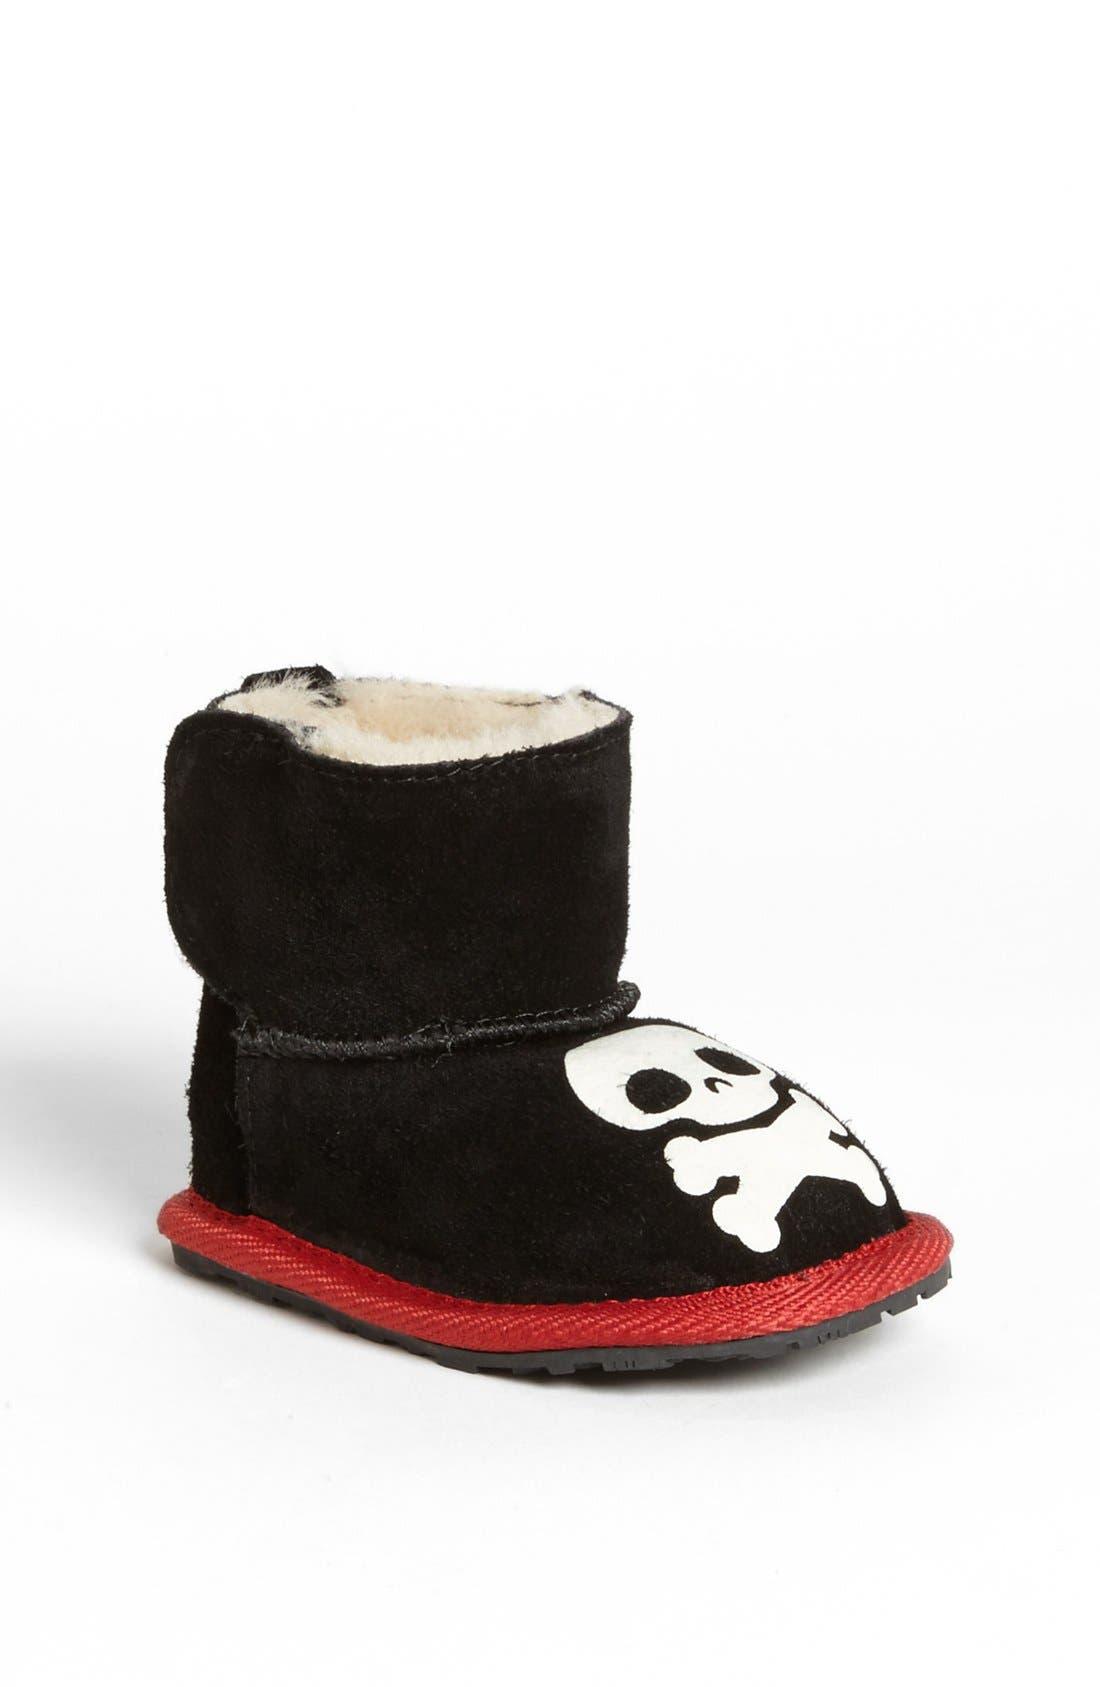 Alternate Image 1 Selected - EMU Australia 'Scallywag' Boot (Baby & Walker)